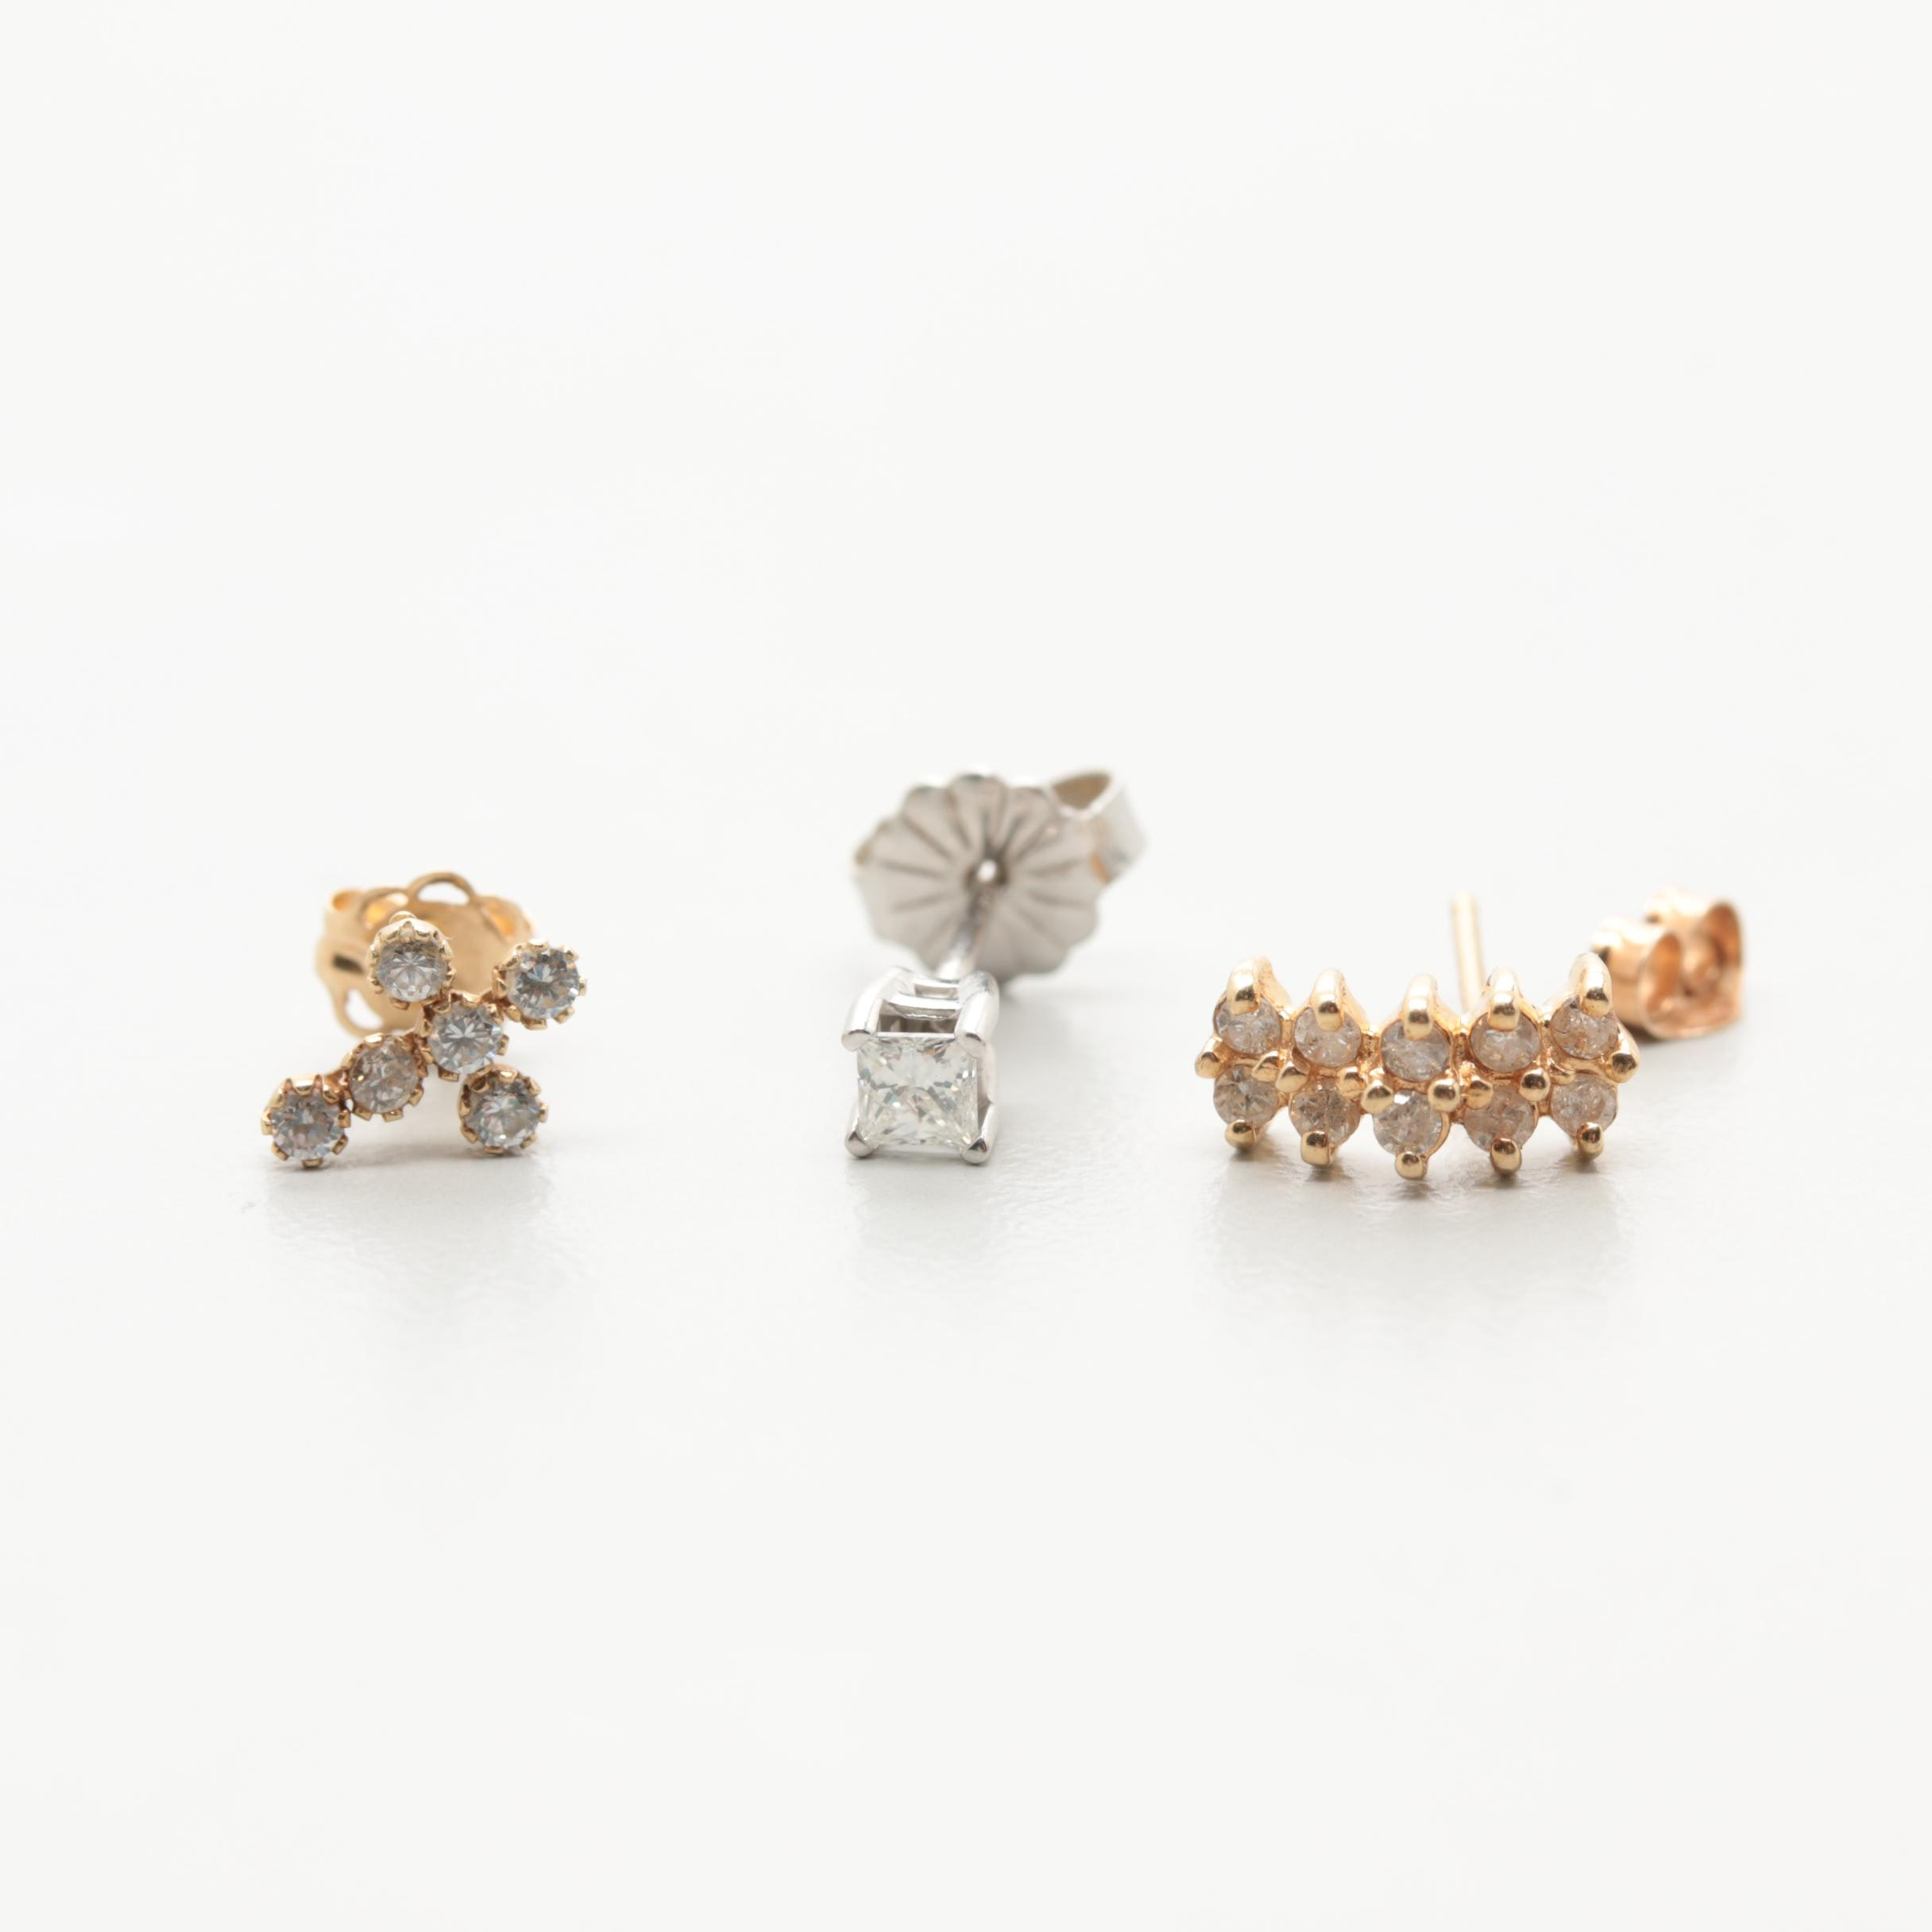 14K Yellow Gold Diamond and Cubic Zirconia Single Earring Assortment